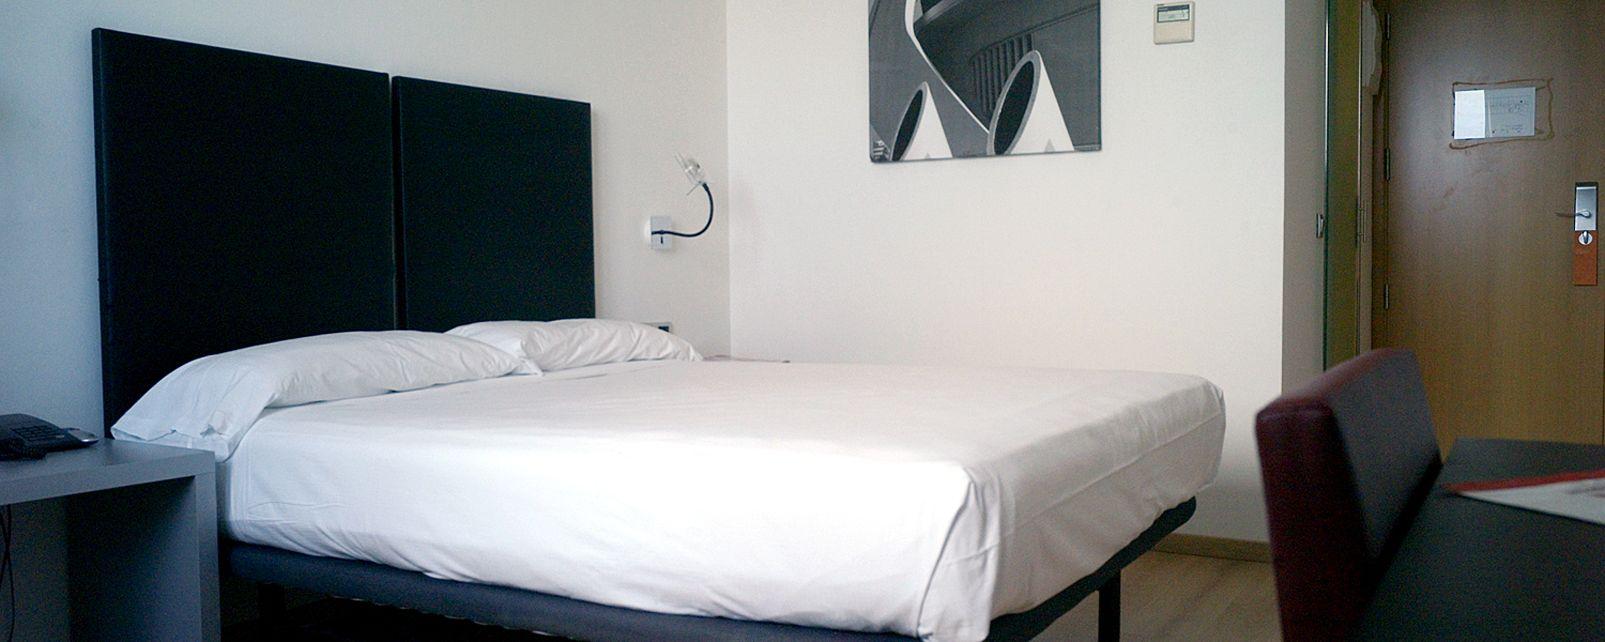 Hotel Ilunion Aqua 3